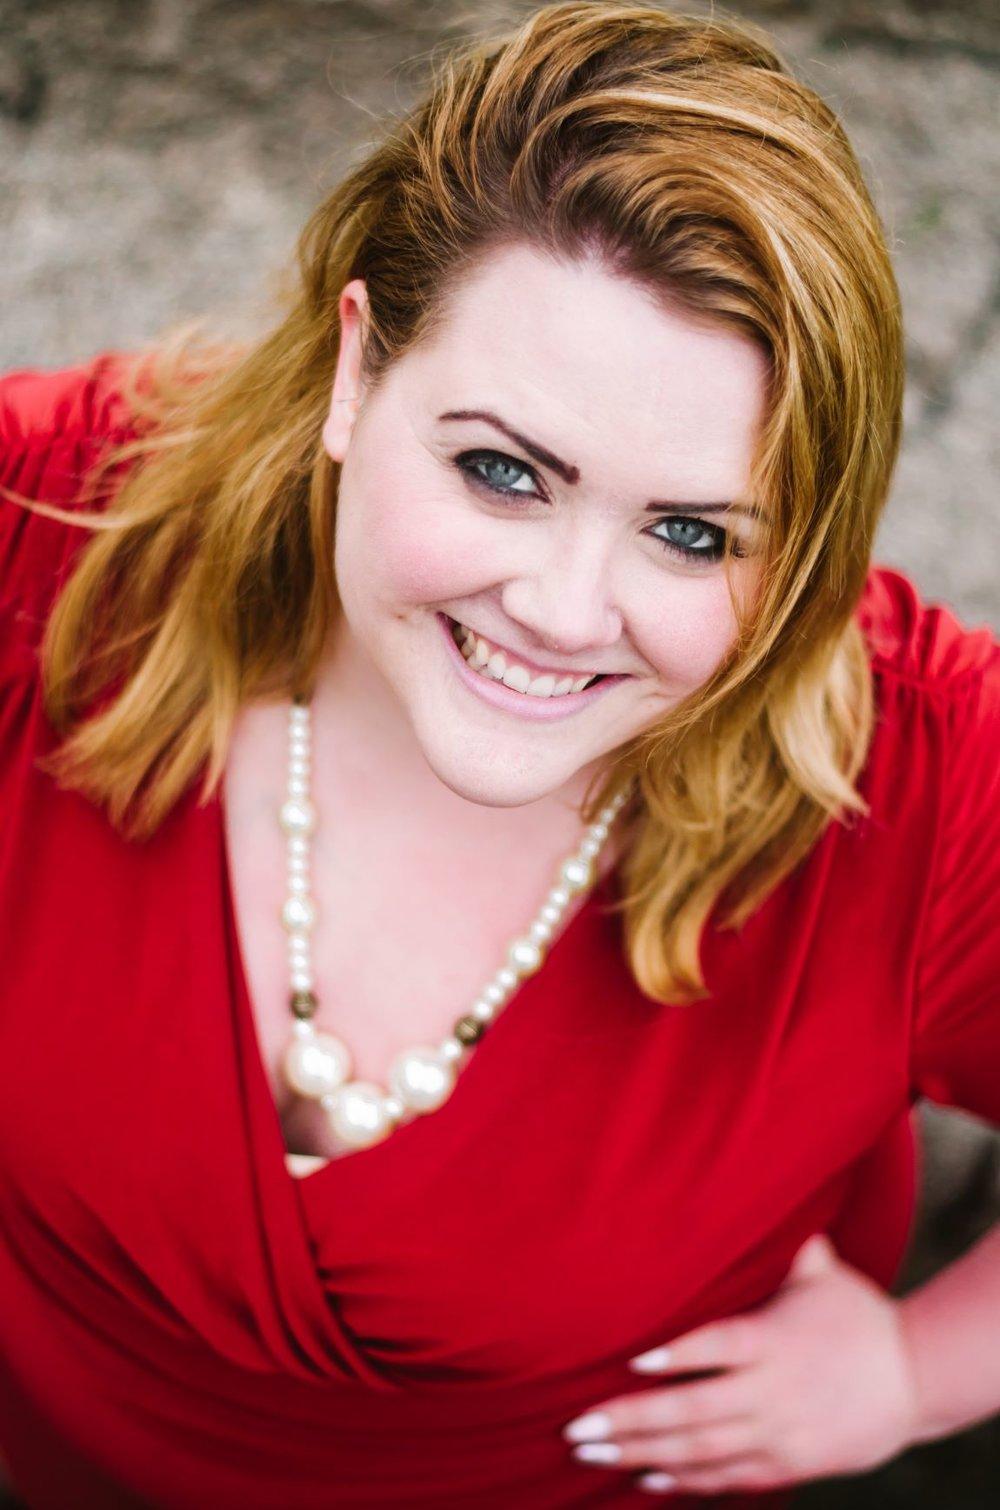 2019 Laura McHugh Headshot - Laura McHugh.jpg